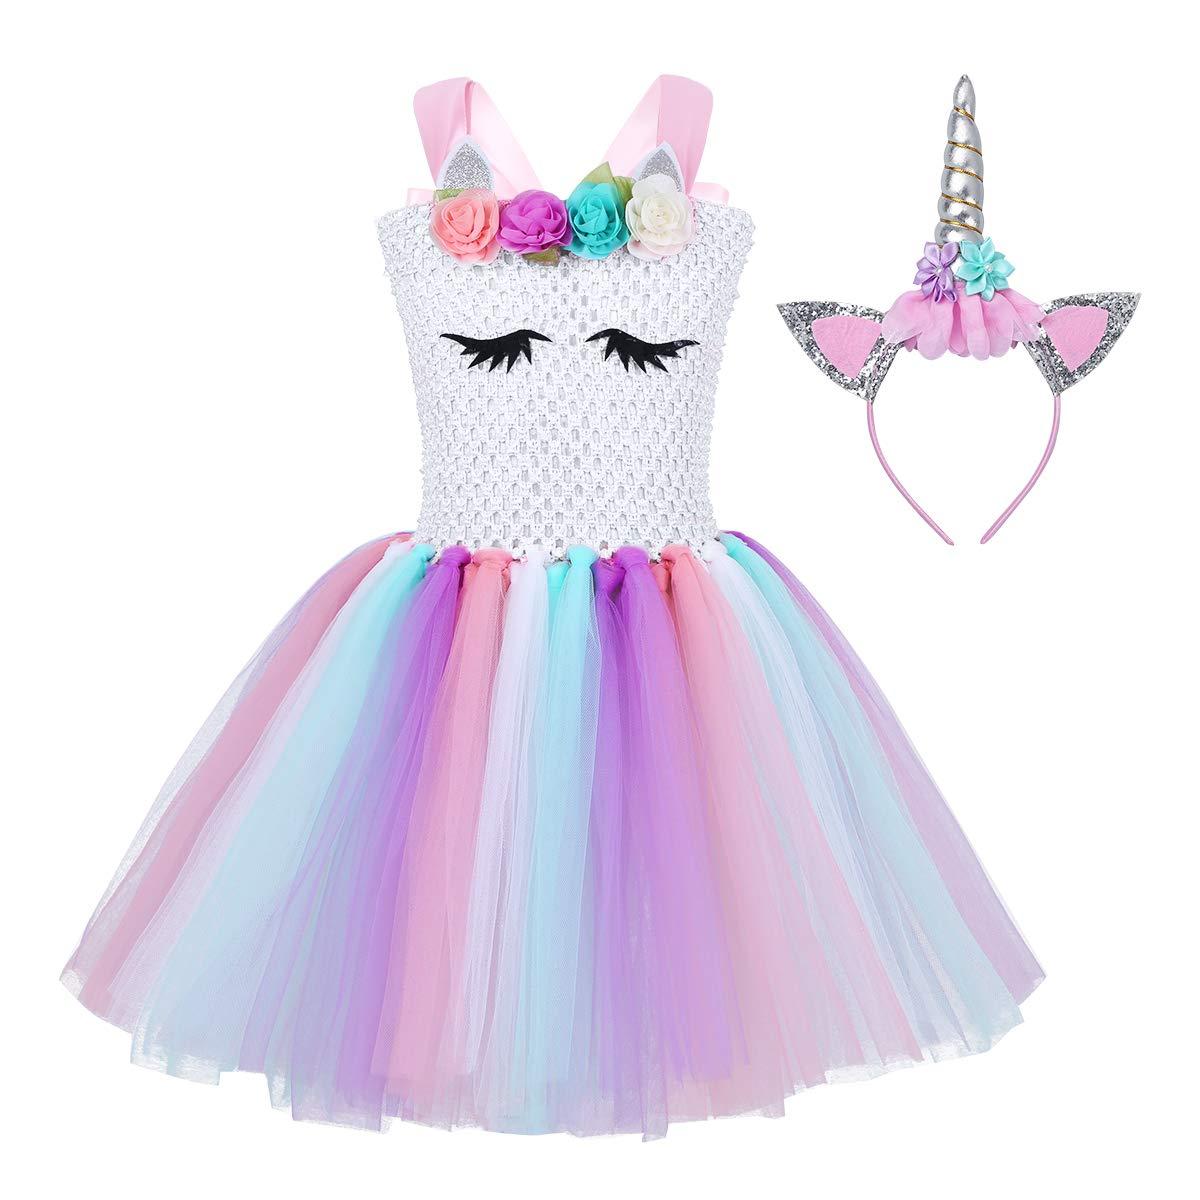 YiZYiF Girls' Pastel Flowers Uni-Corn Tutu Dress with Headband Princess Birthday Outfits Halloween Dress up White01 6-7